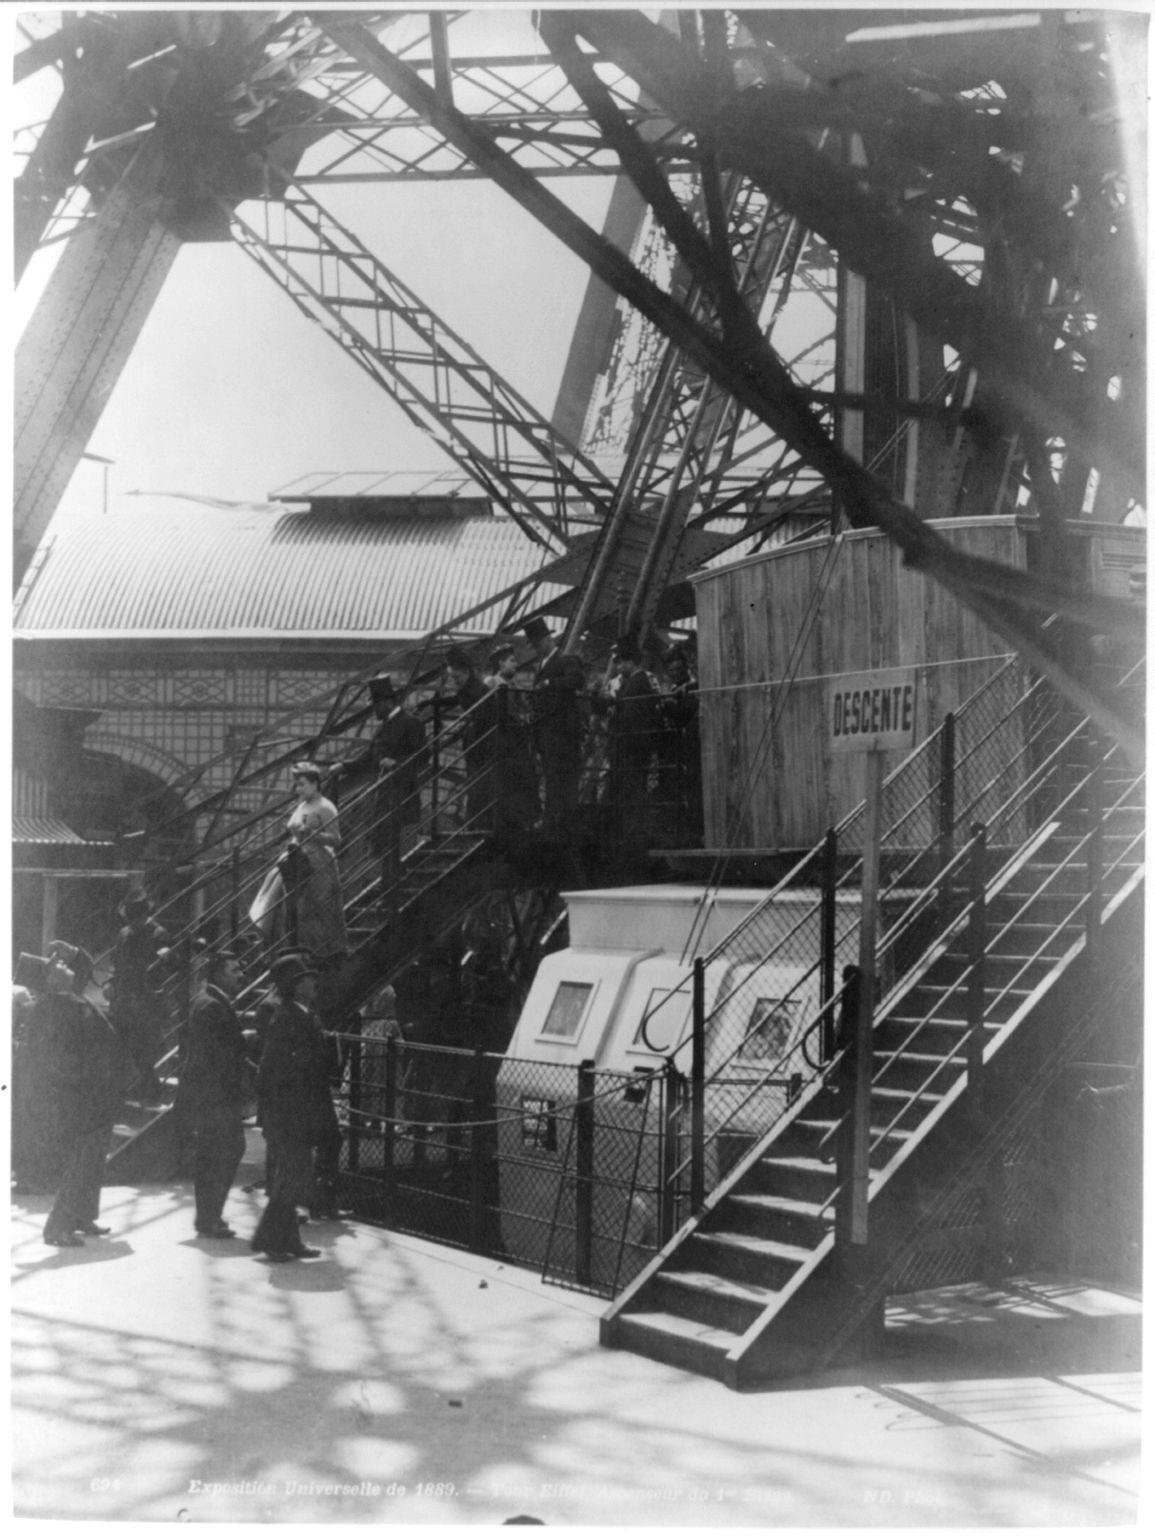 05. 1889. Эйфелева башня. Лифт 1-го этажа